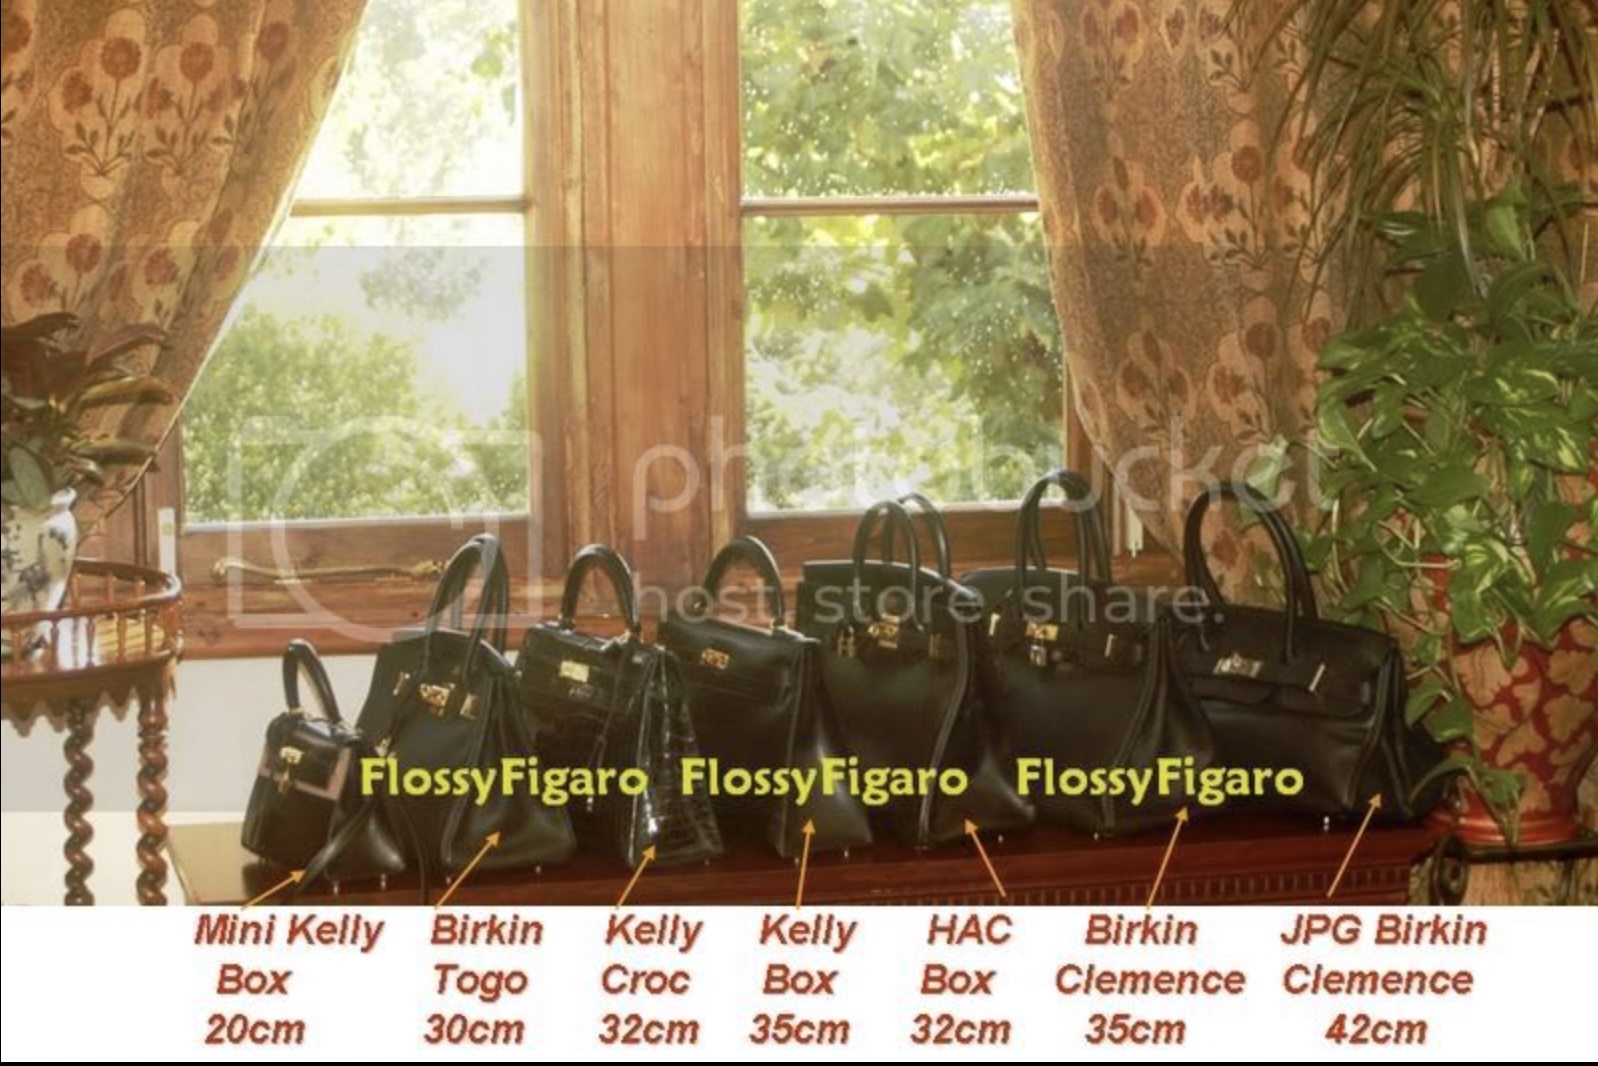 Mini Kelly (old version), B30, K32, K35, HAC32, B35, JPG42. Photo via TPFer @FlossyFigaro